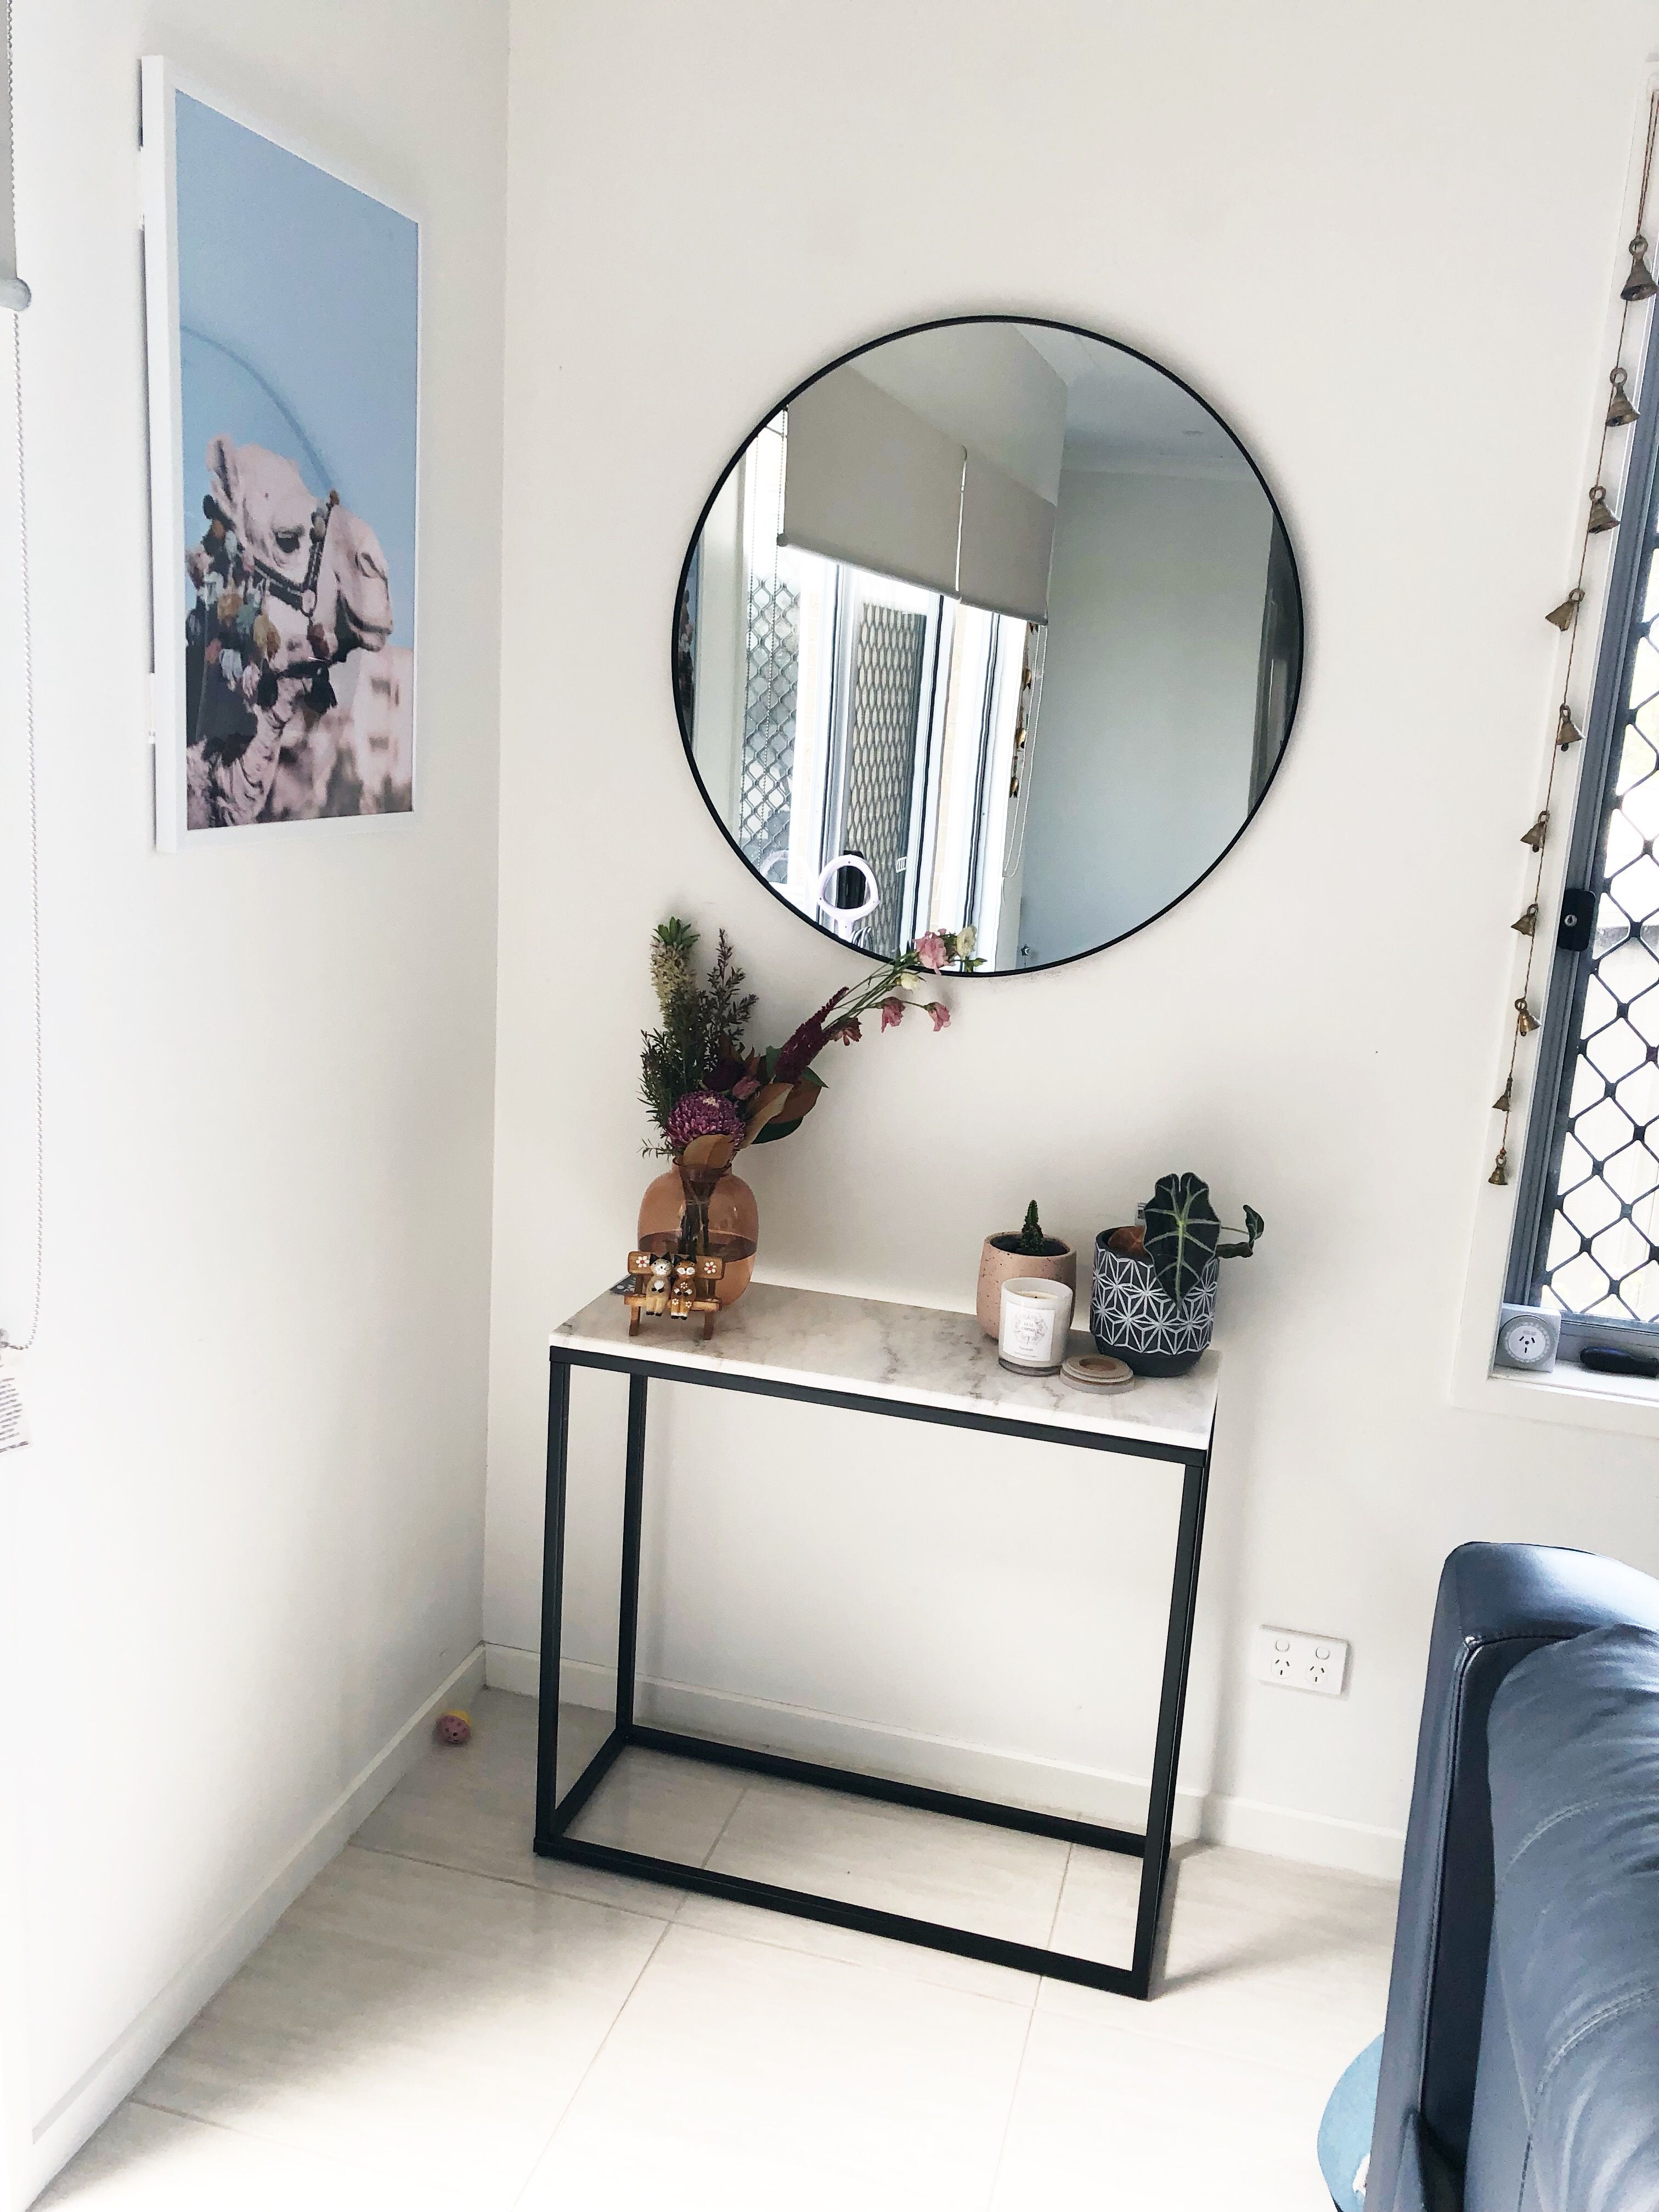 kmartstyling Interior design, Interior, Home decor